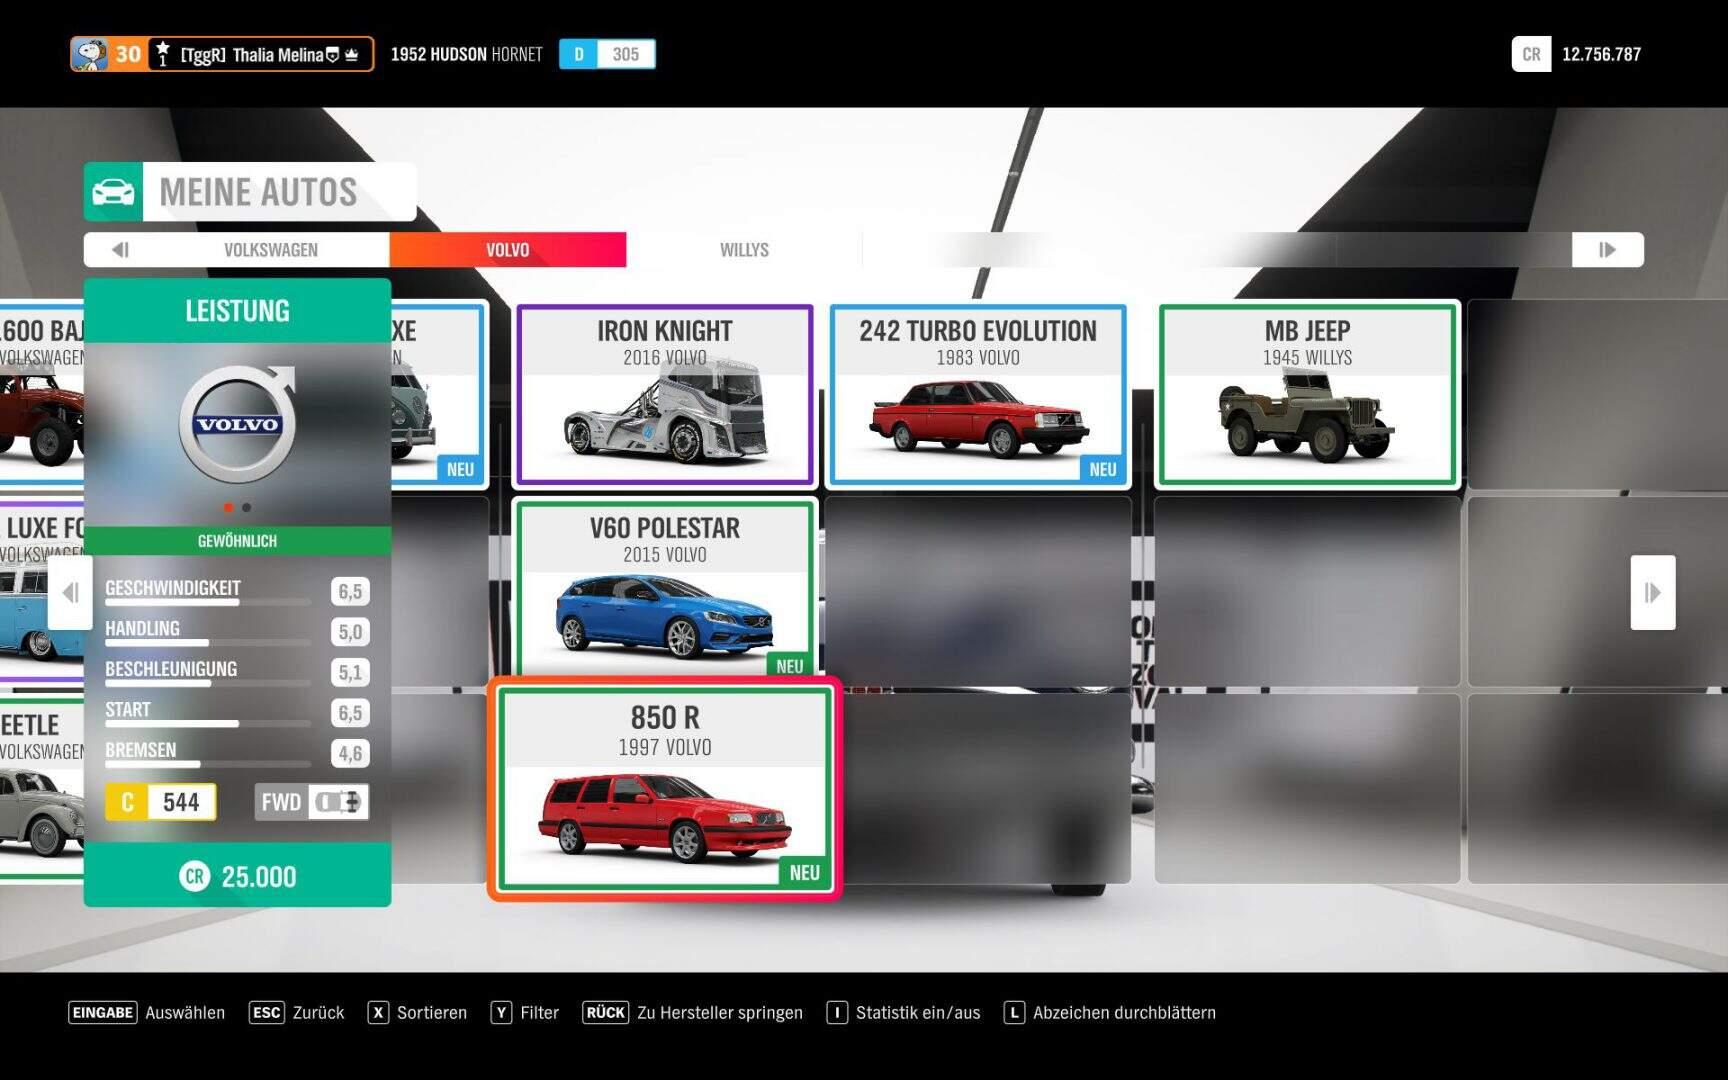 Forza Horizon 4 1997 Volvo 850 R